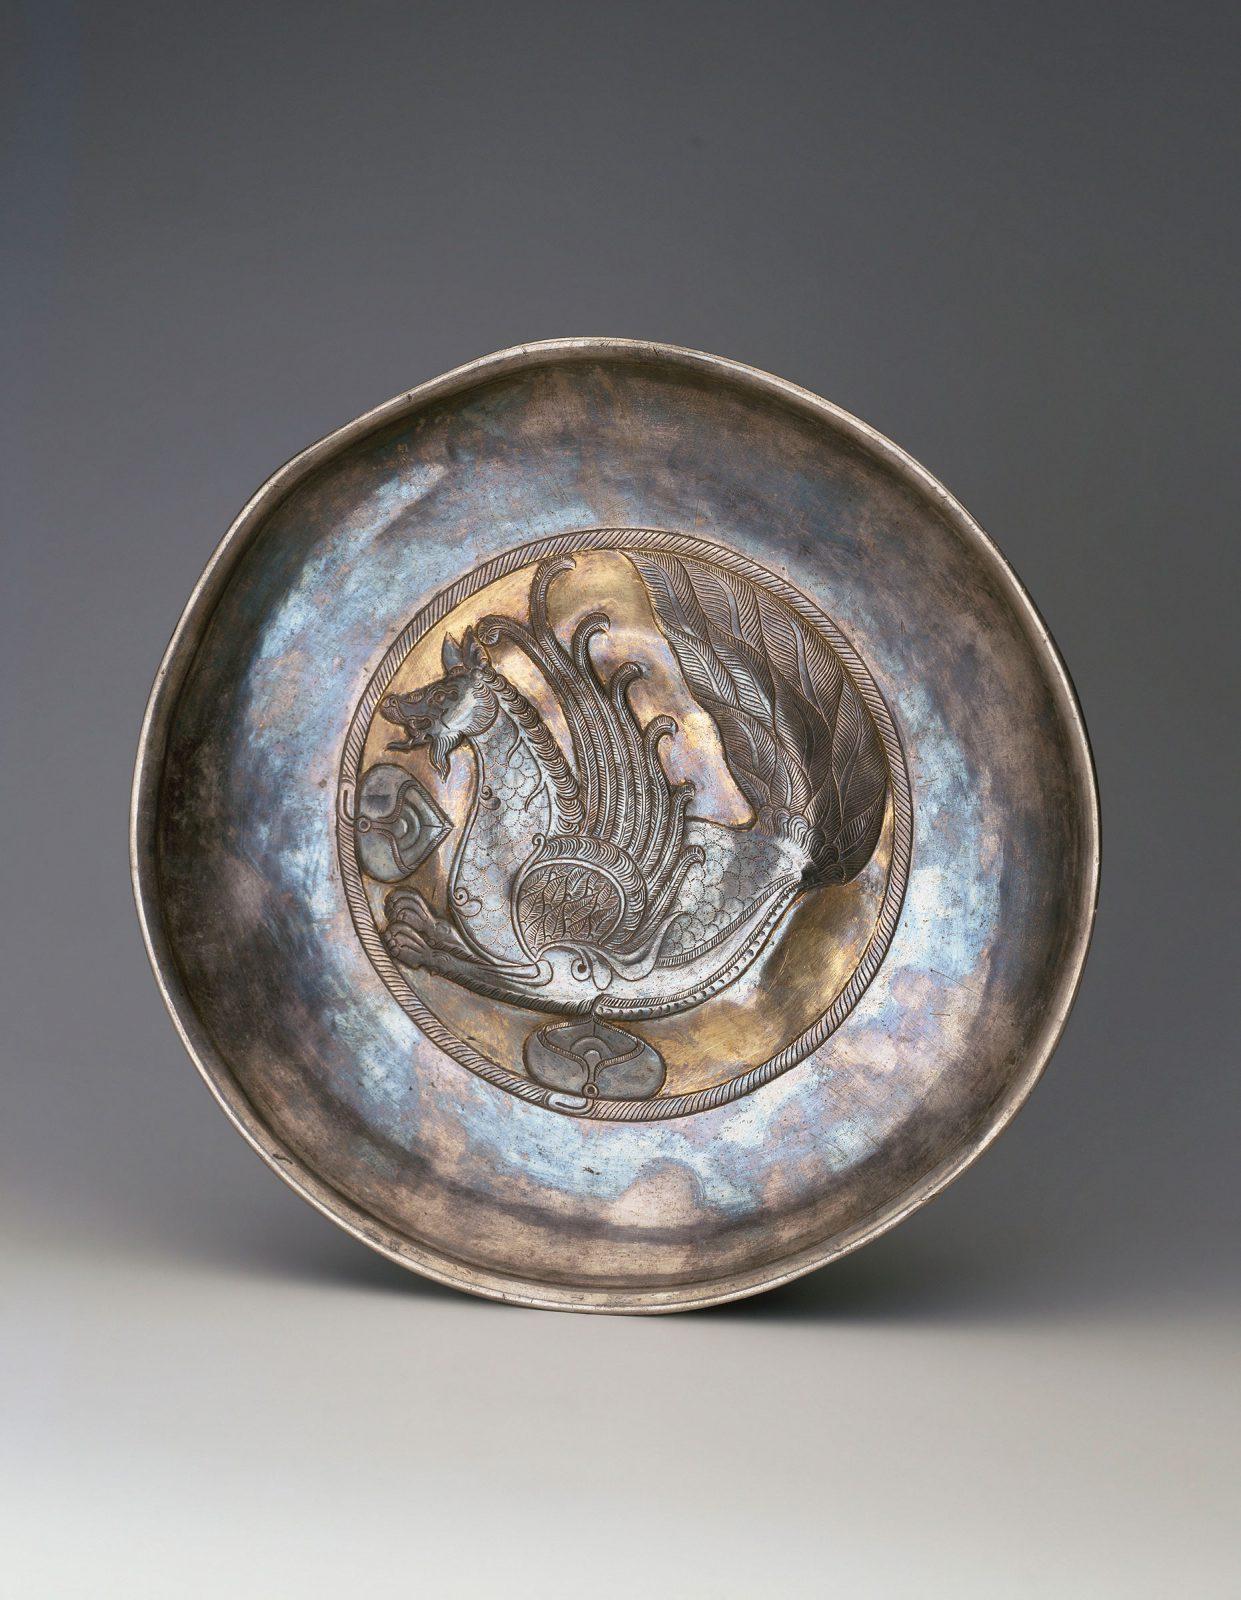 Plain shallow bowl with elaborate central design of a Senmurv